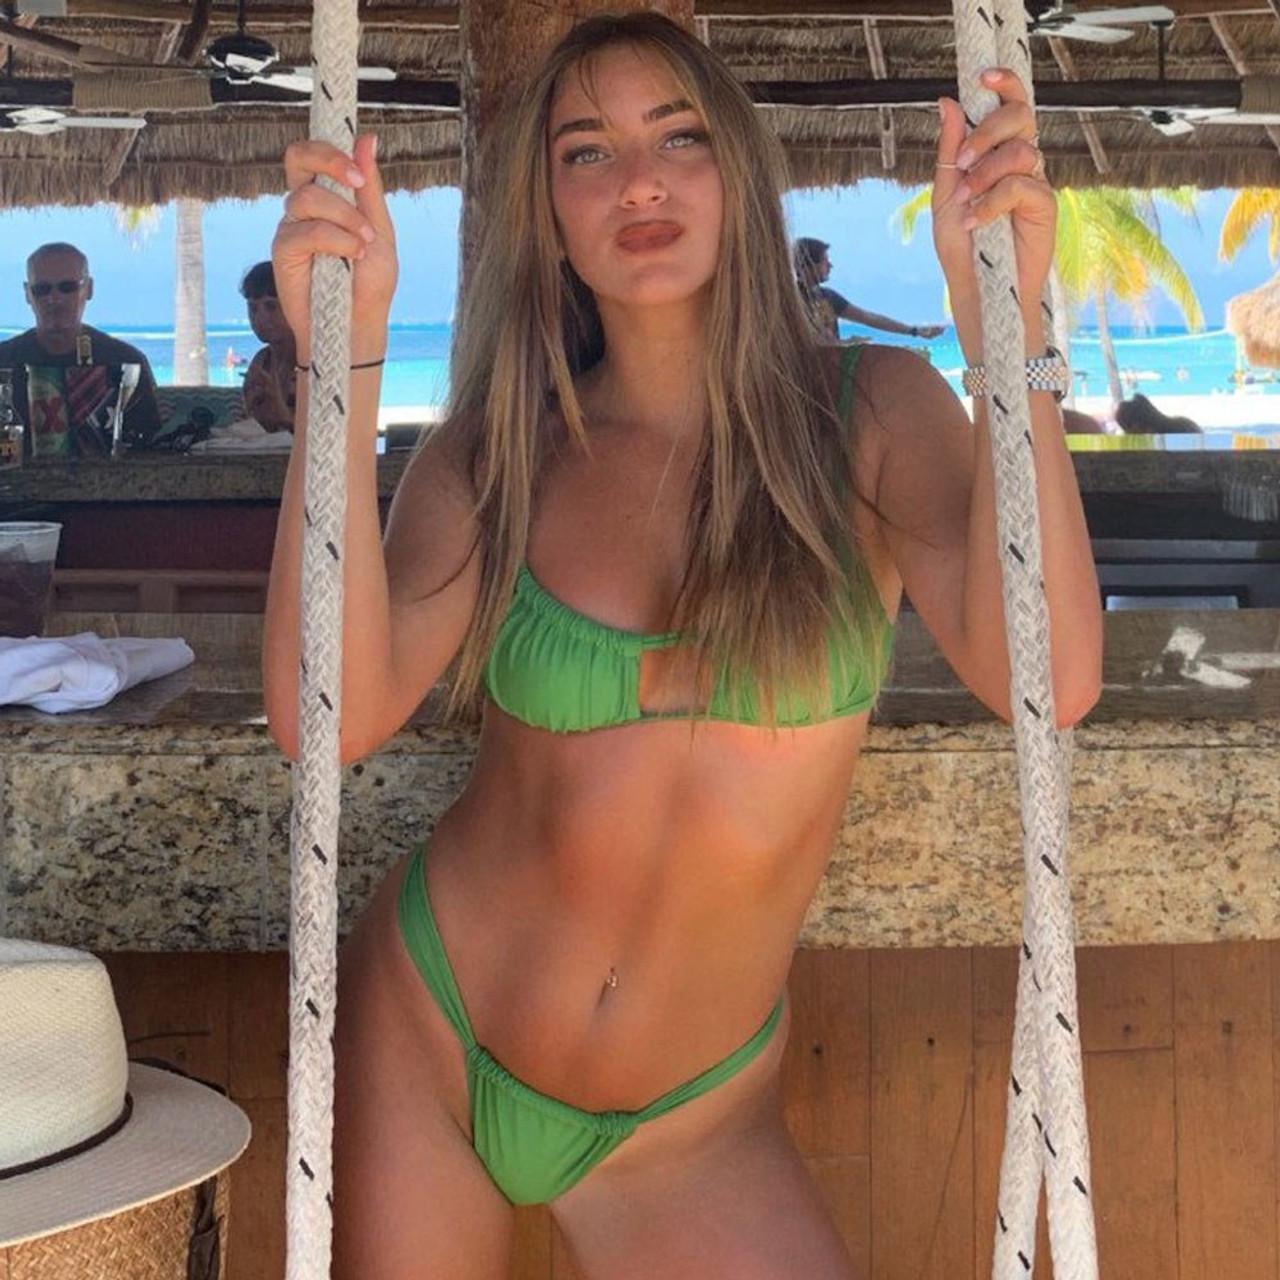 56ae370e381f8 New Bikini Set 2019 Women Swimsuit Sexy Swimwear Female Striped Thong  Beachwear Summer Bathing Suit Maillot ...